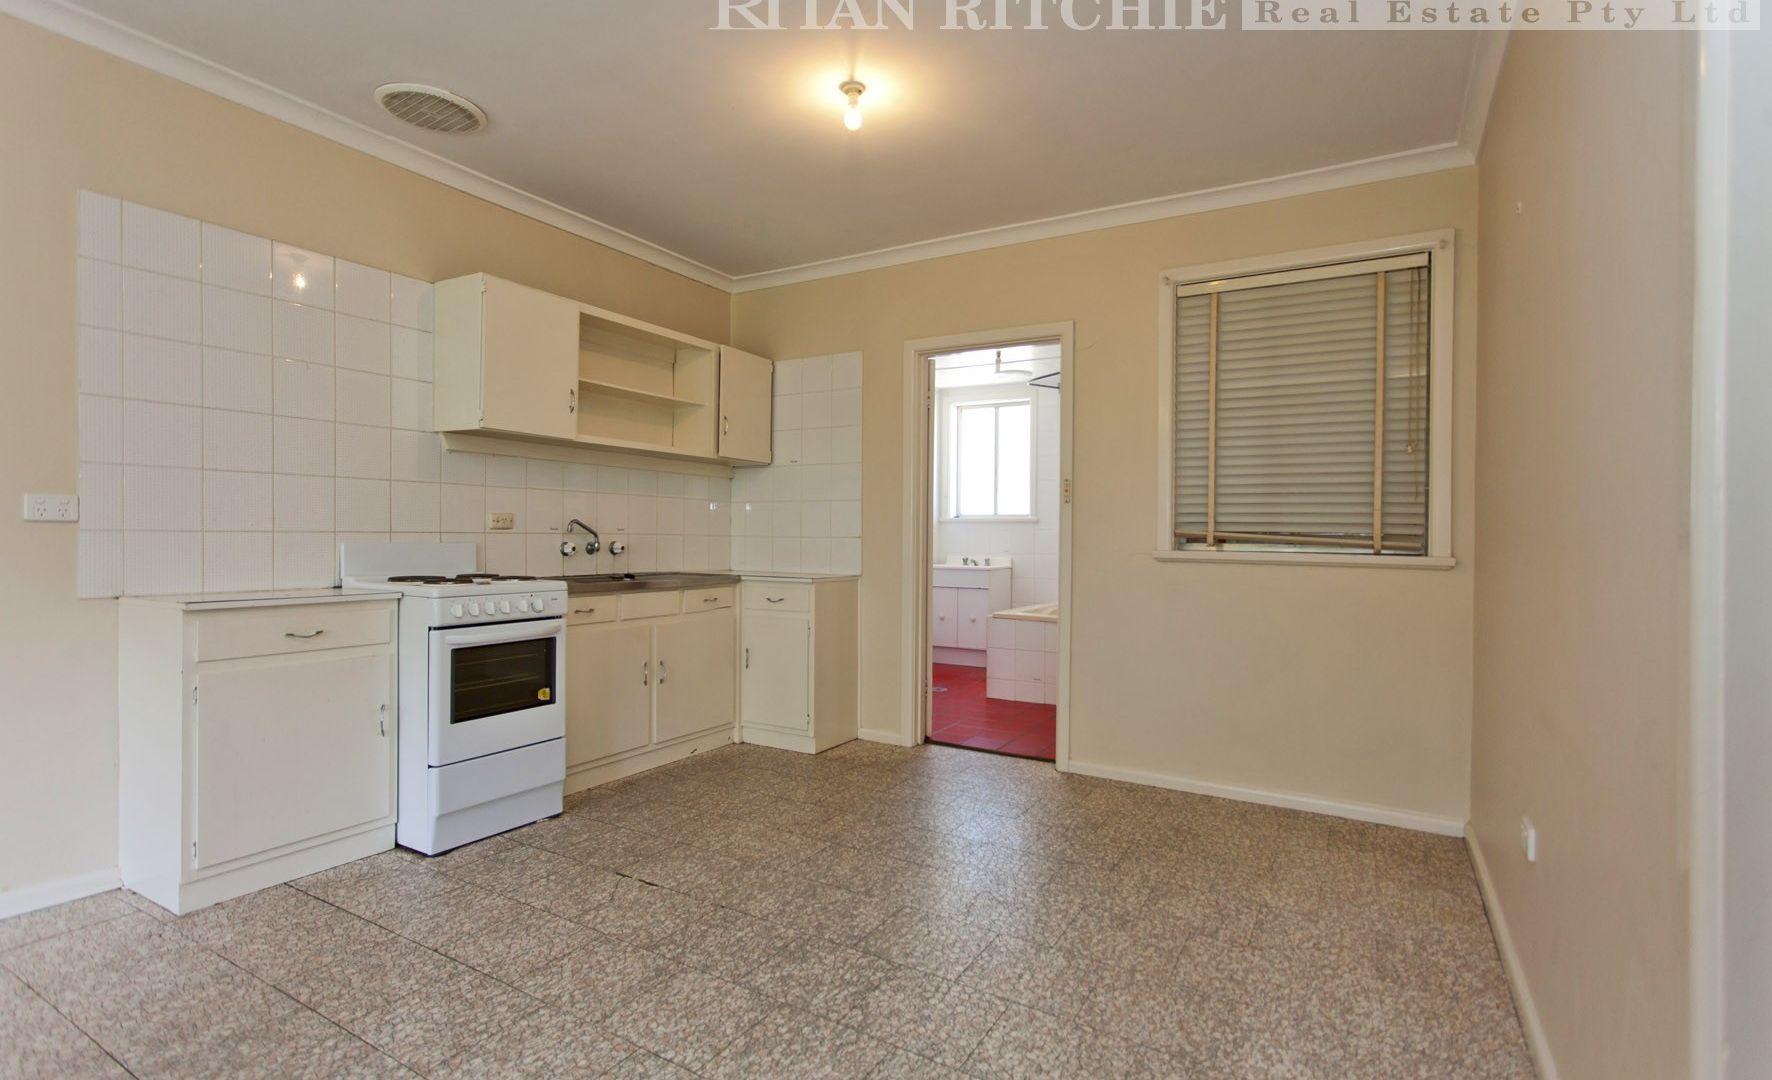 9/707 David Street, Albury NSW 2640, Image 1